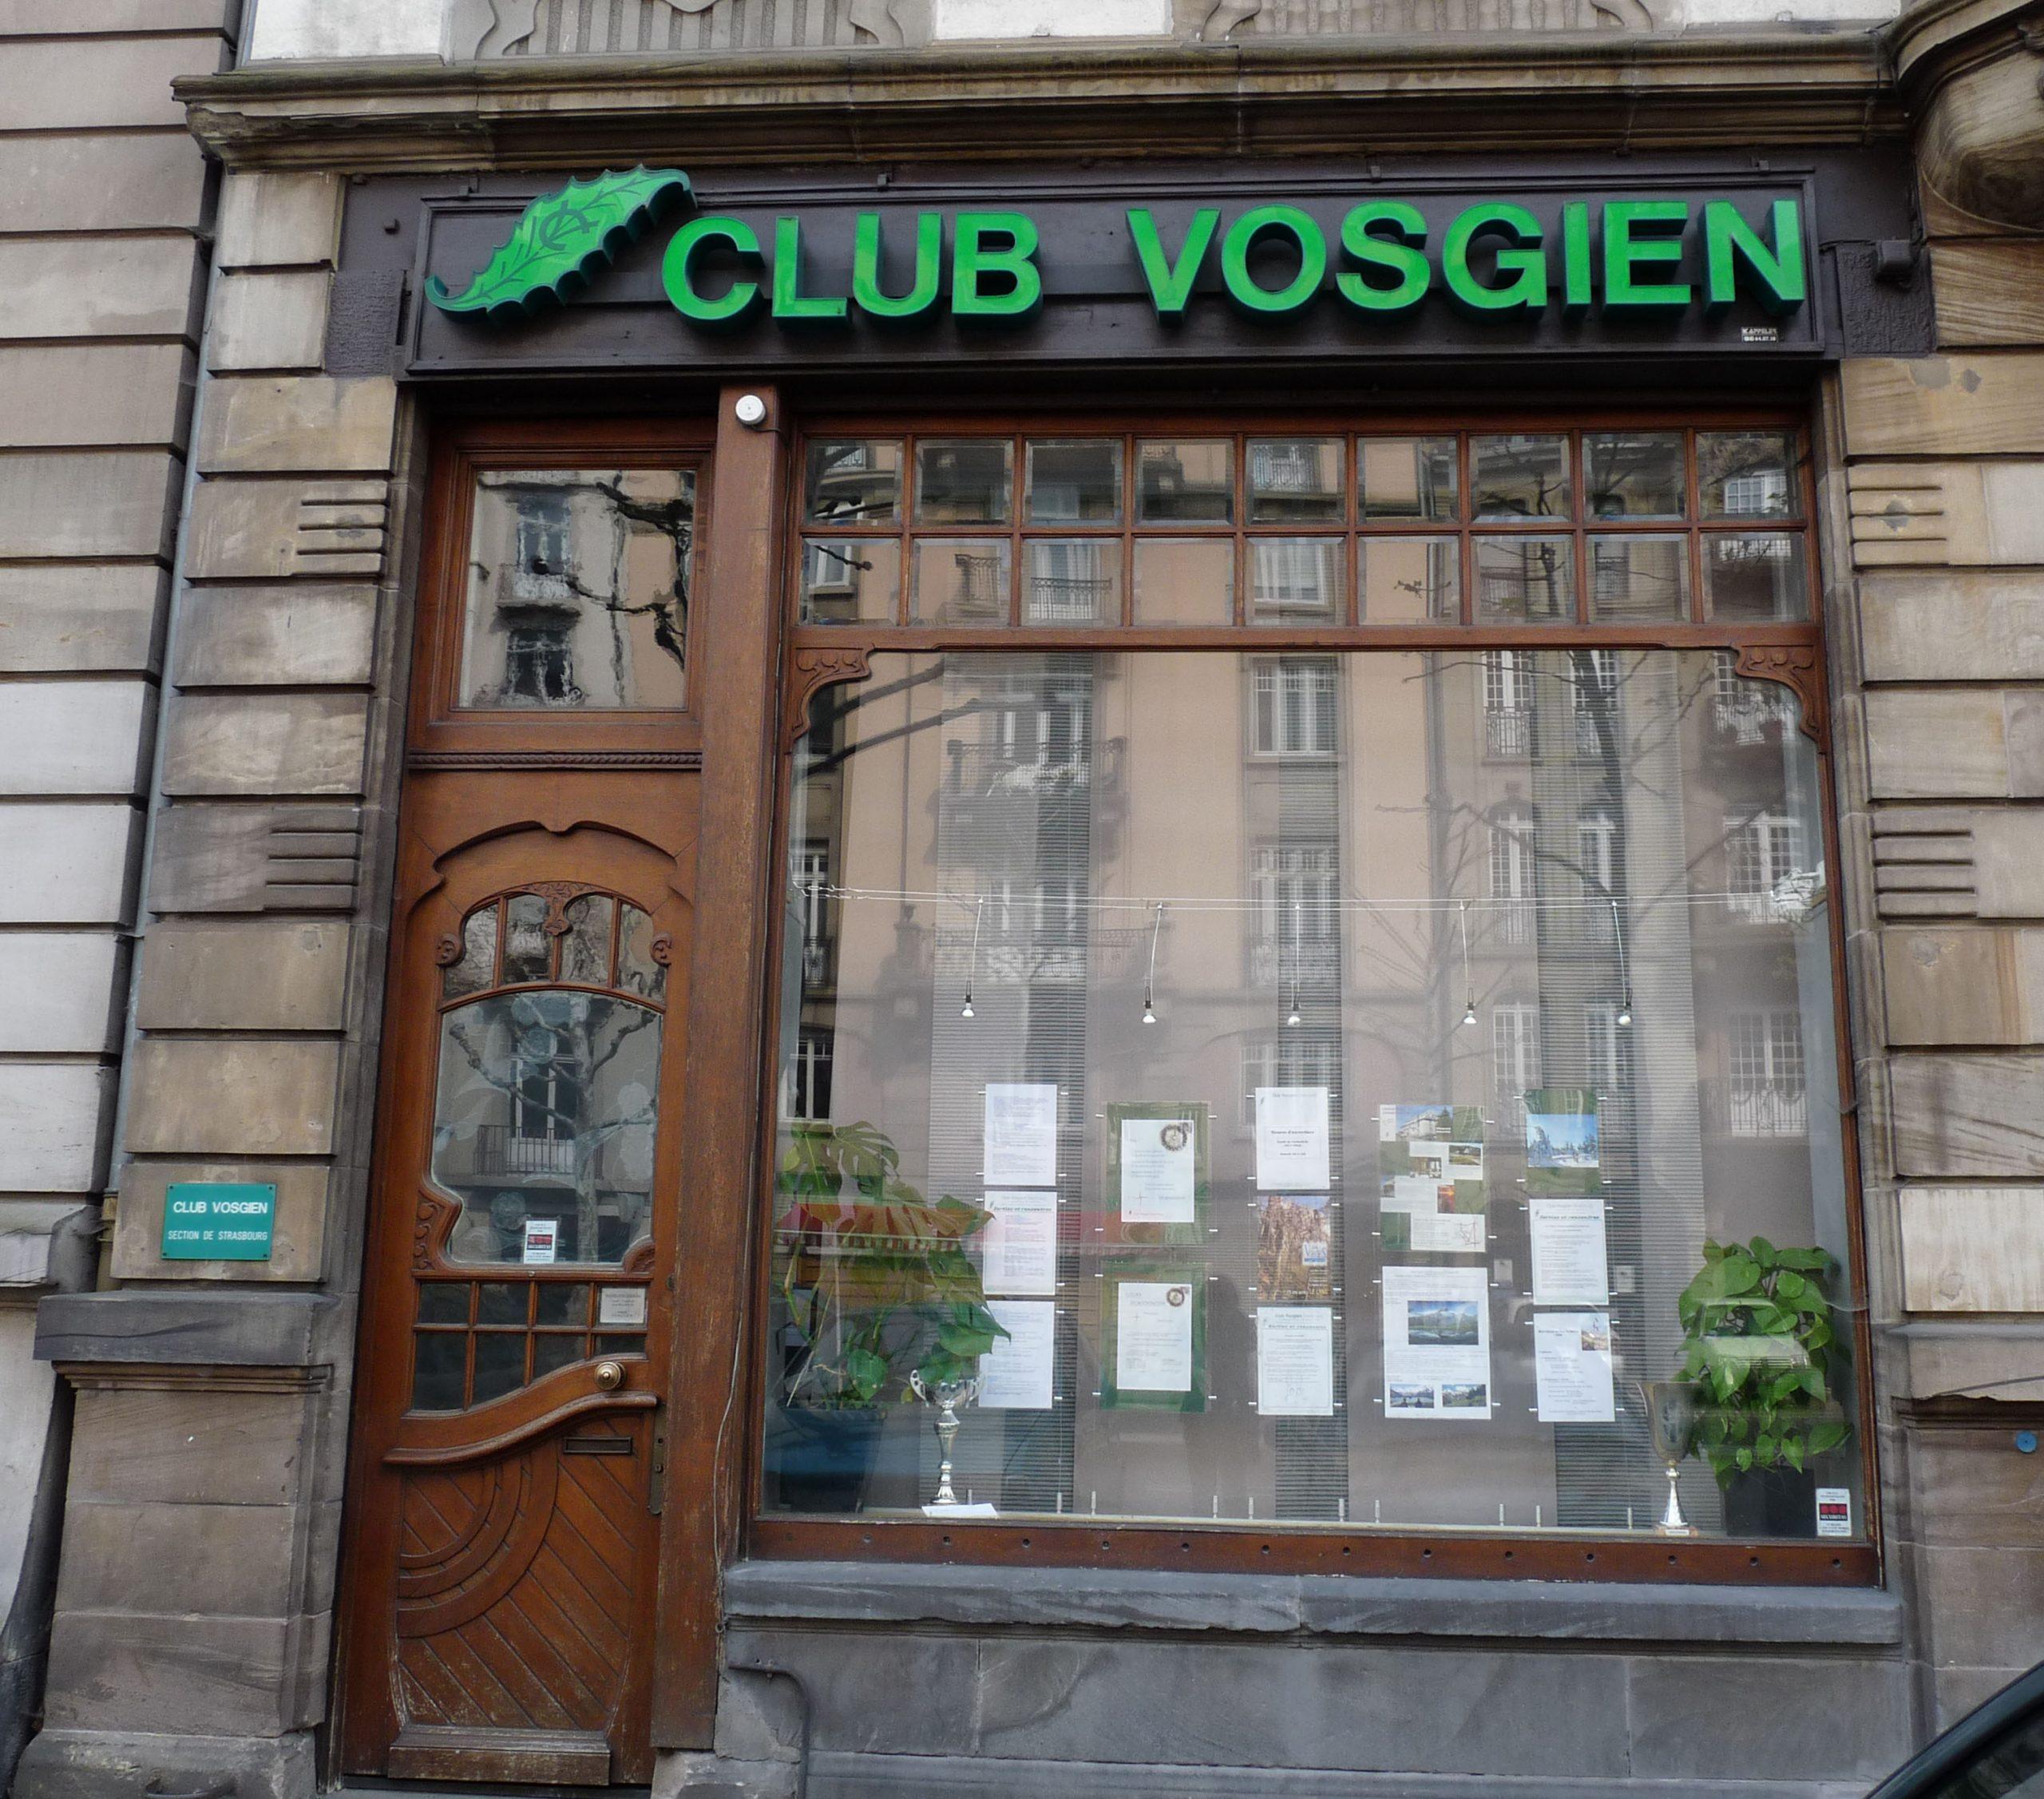 Le siège du Club vosgien à Strasbourg